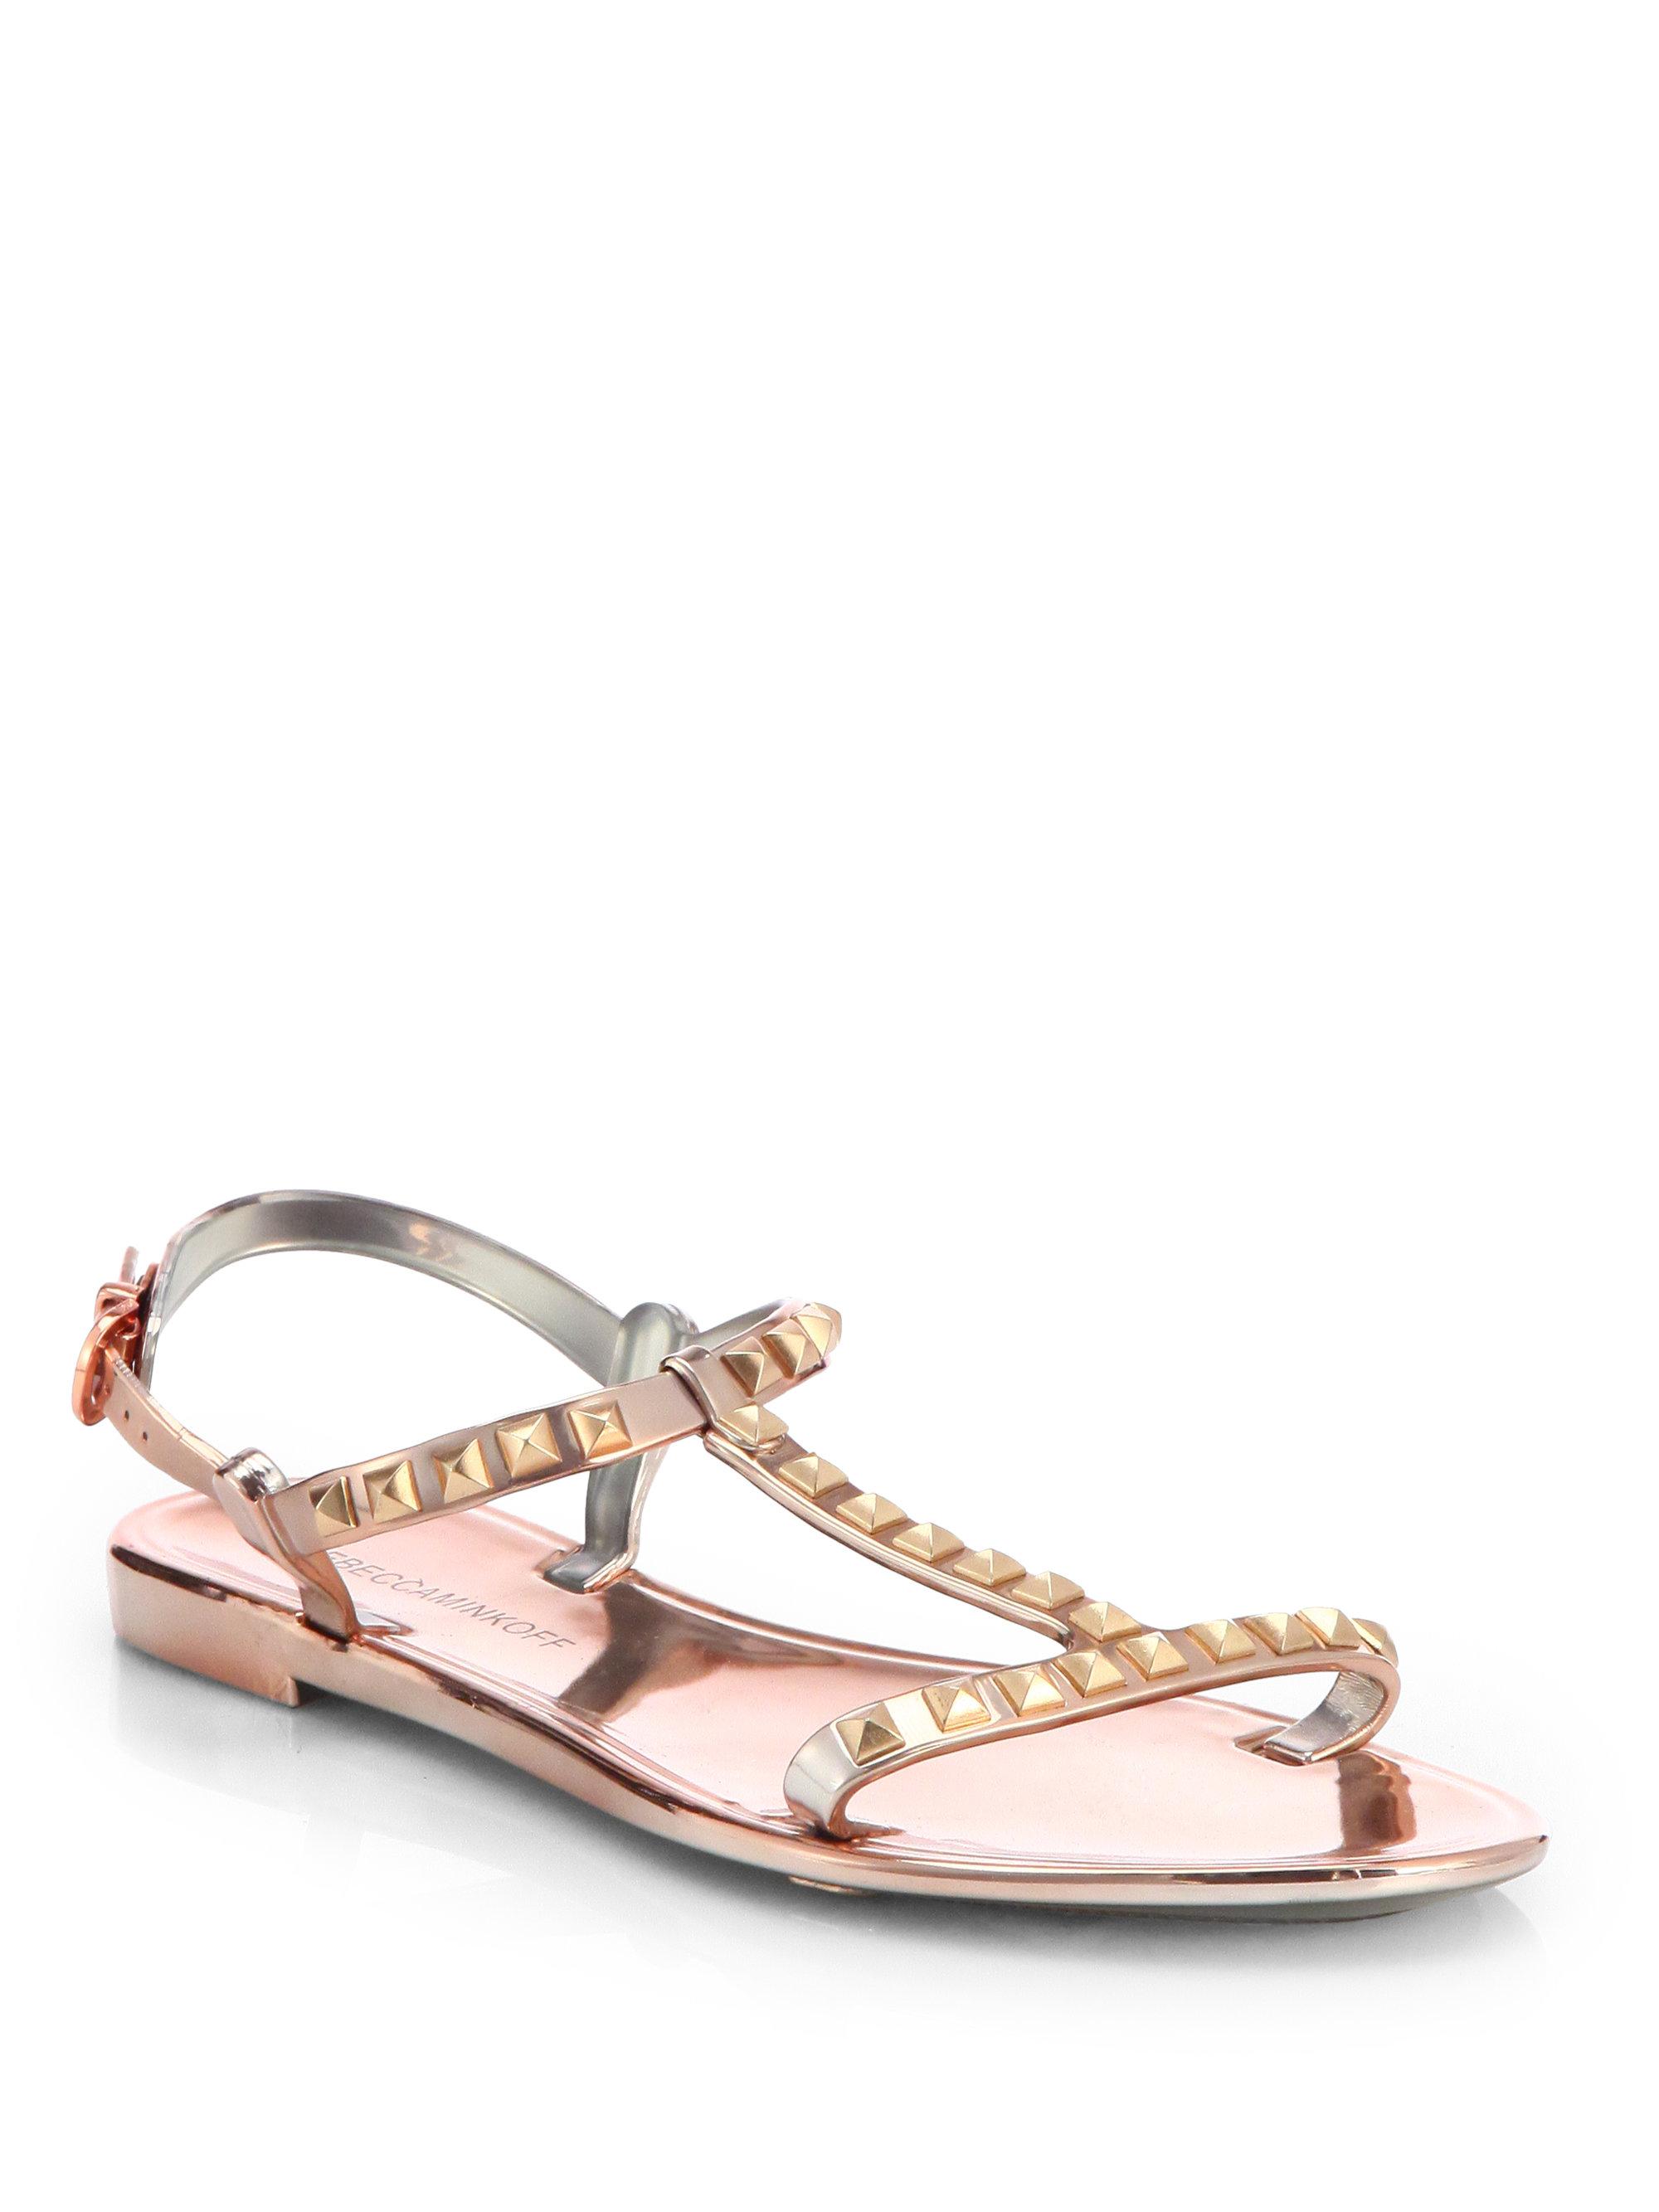 rebecca minkoff sava studded metallic jelly sandals in